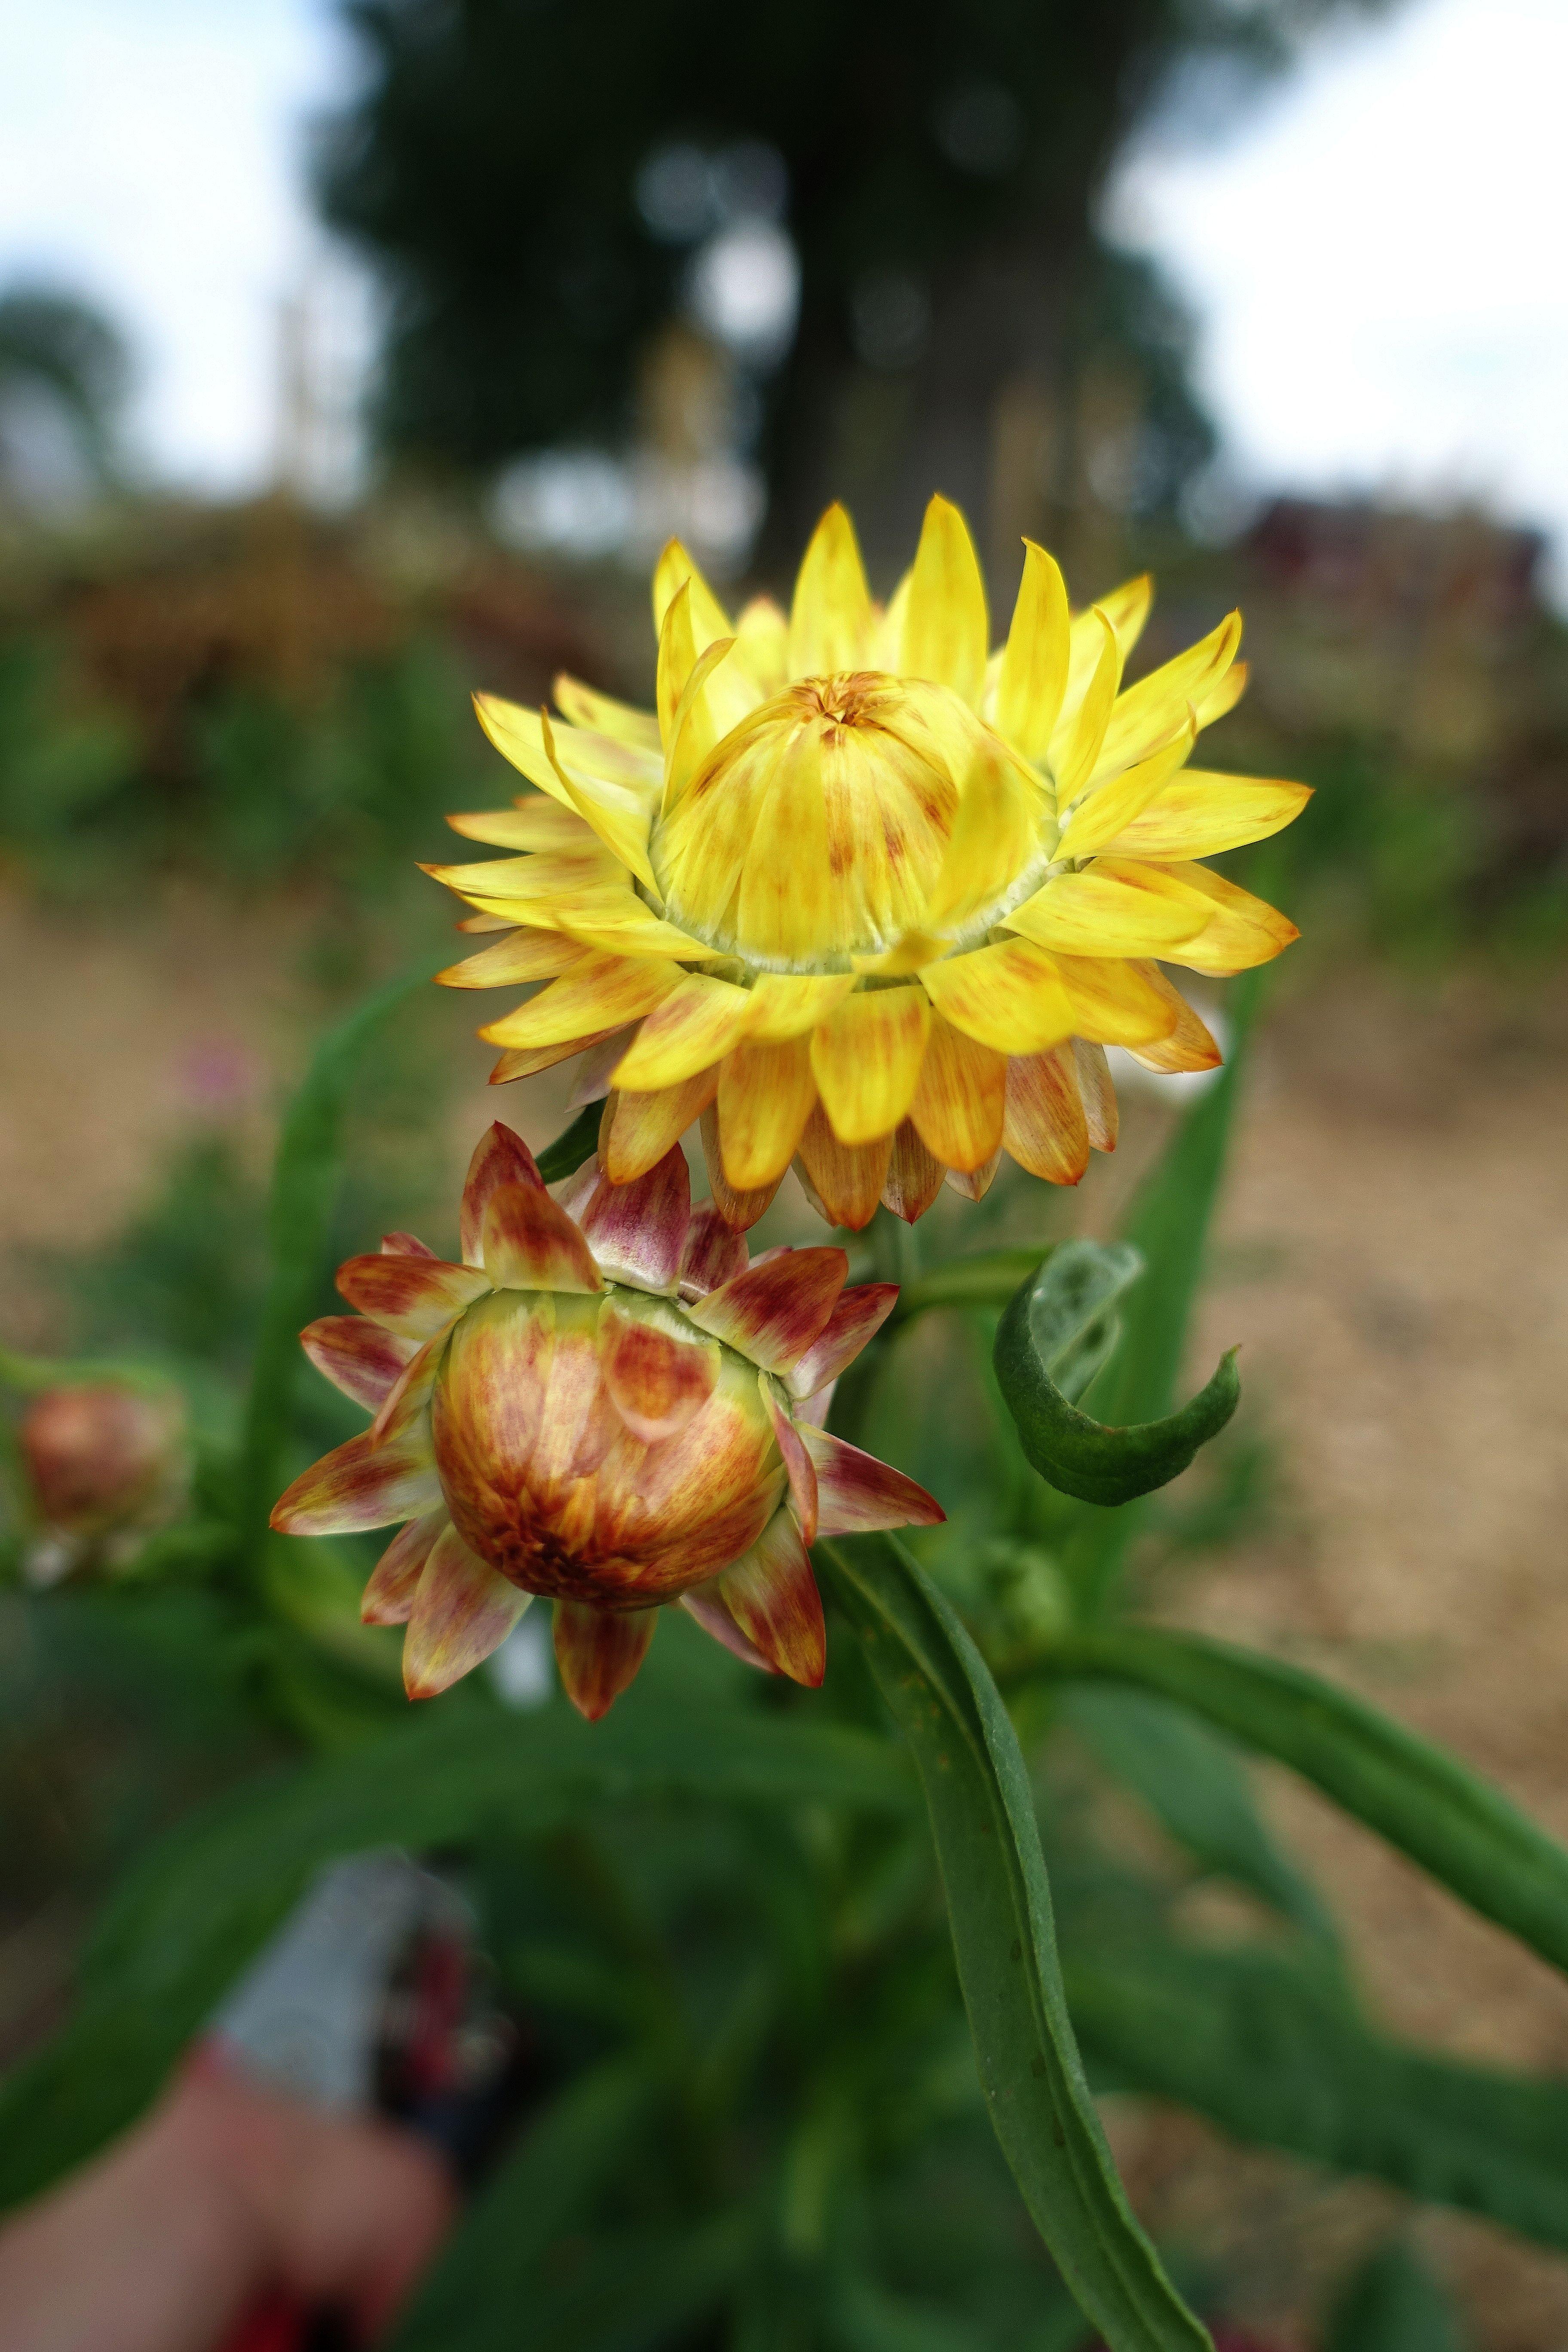 En bild på en gul blomma och en knopp. Yellow everlasting flower.